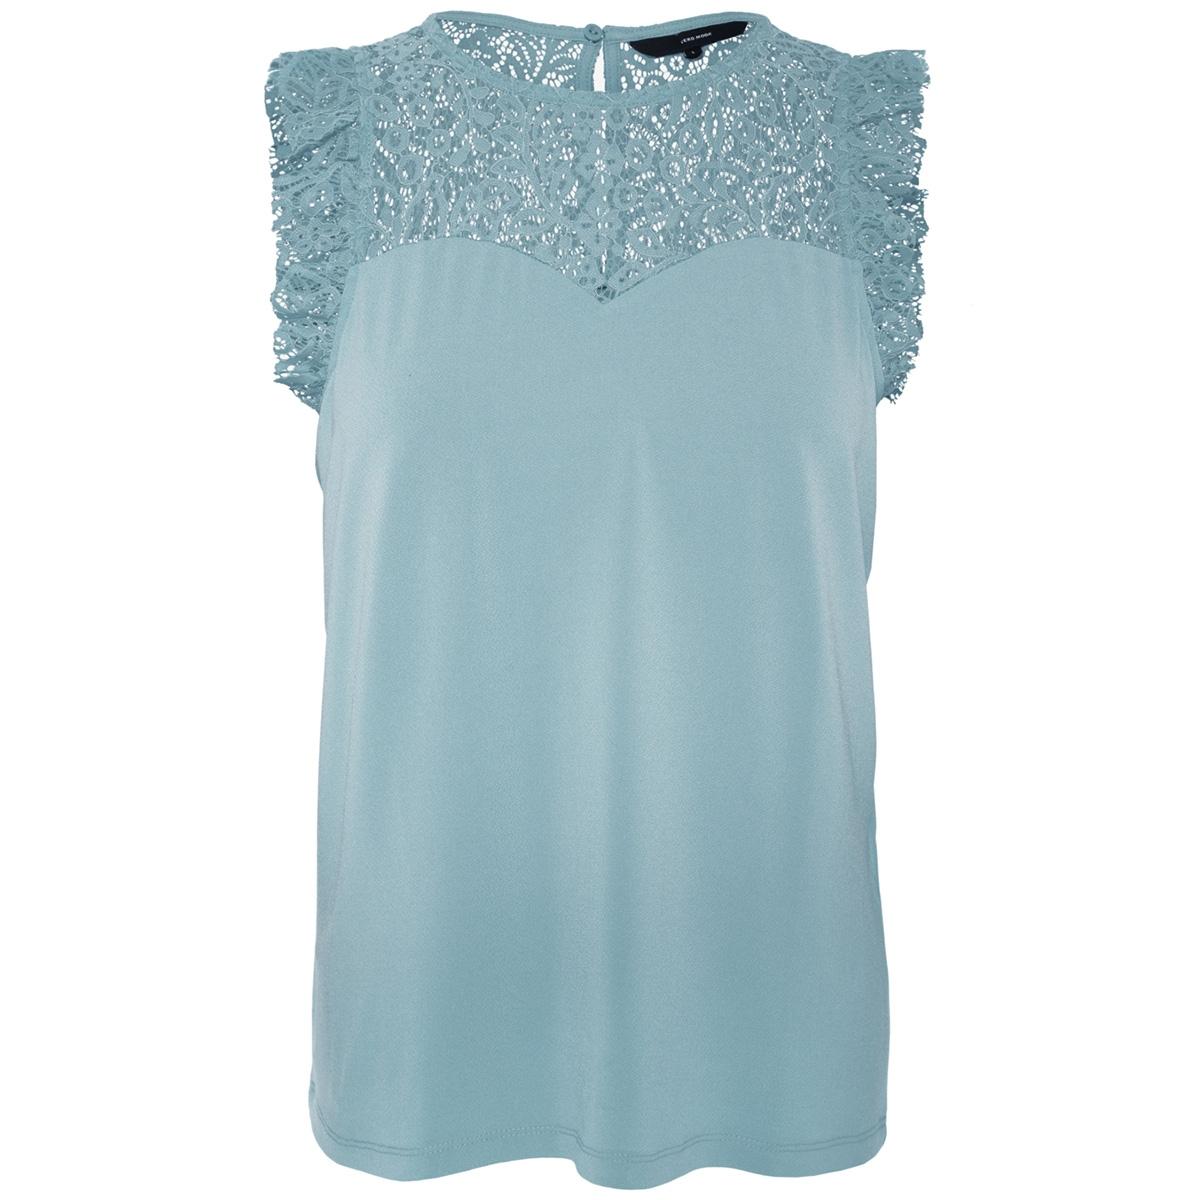 vmalberta sweetheart lace s/l top noos 10196238 vero moda top smoke blue